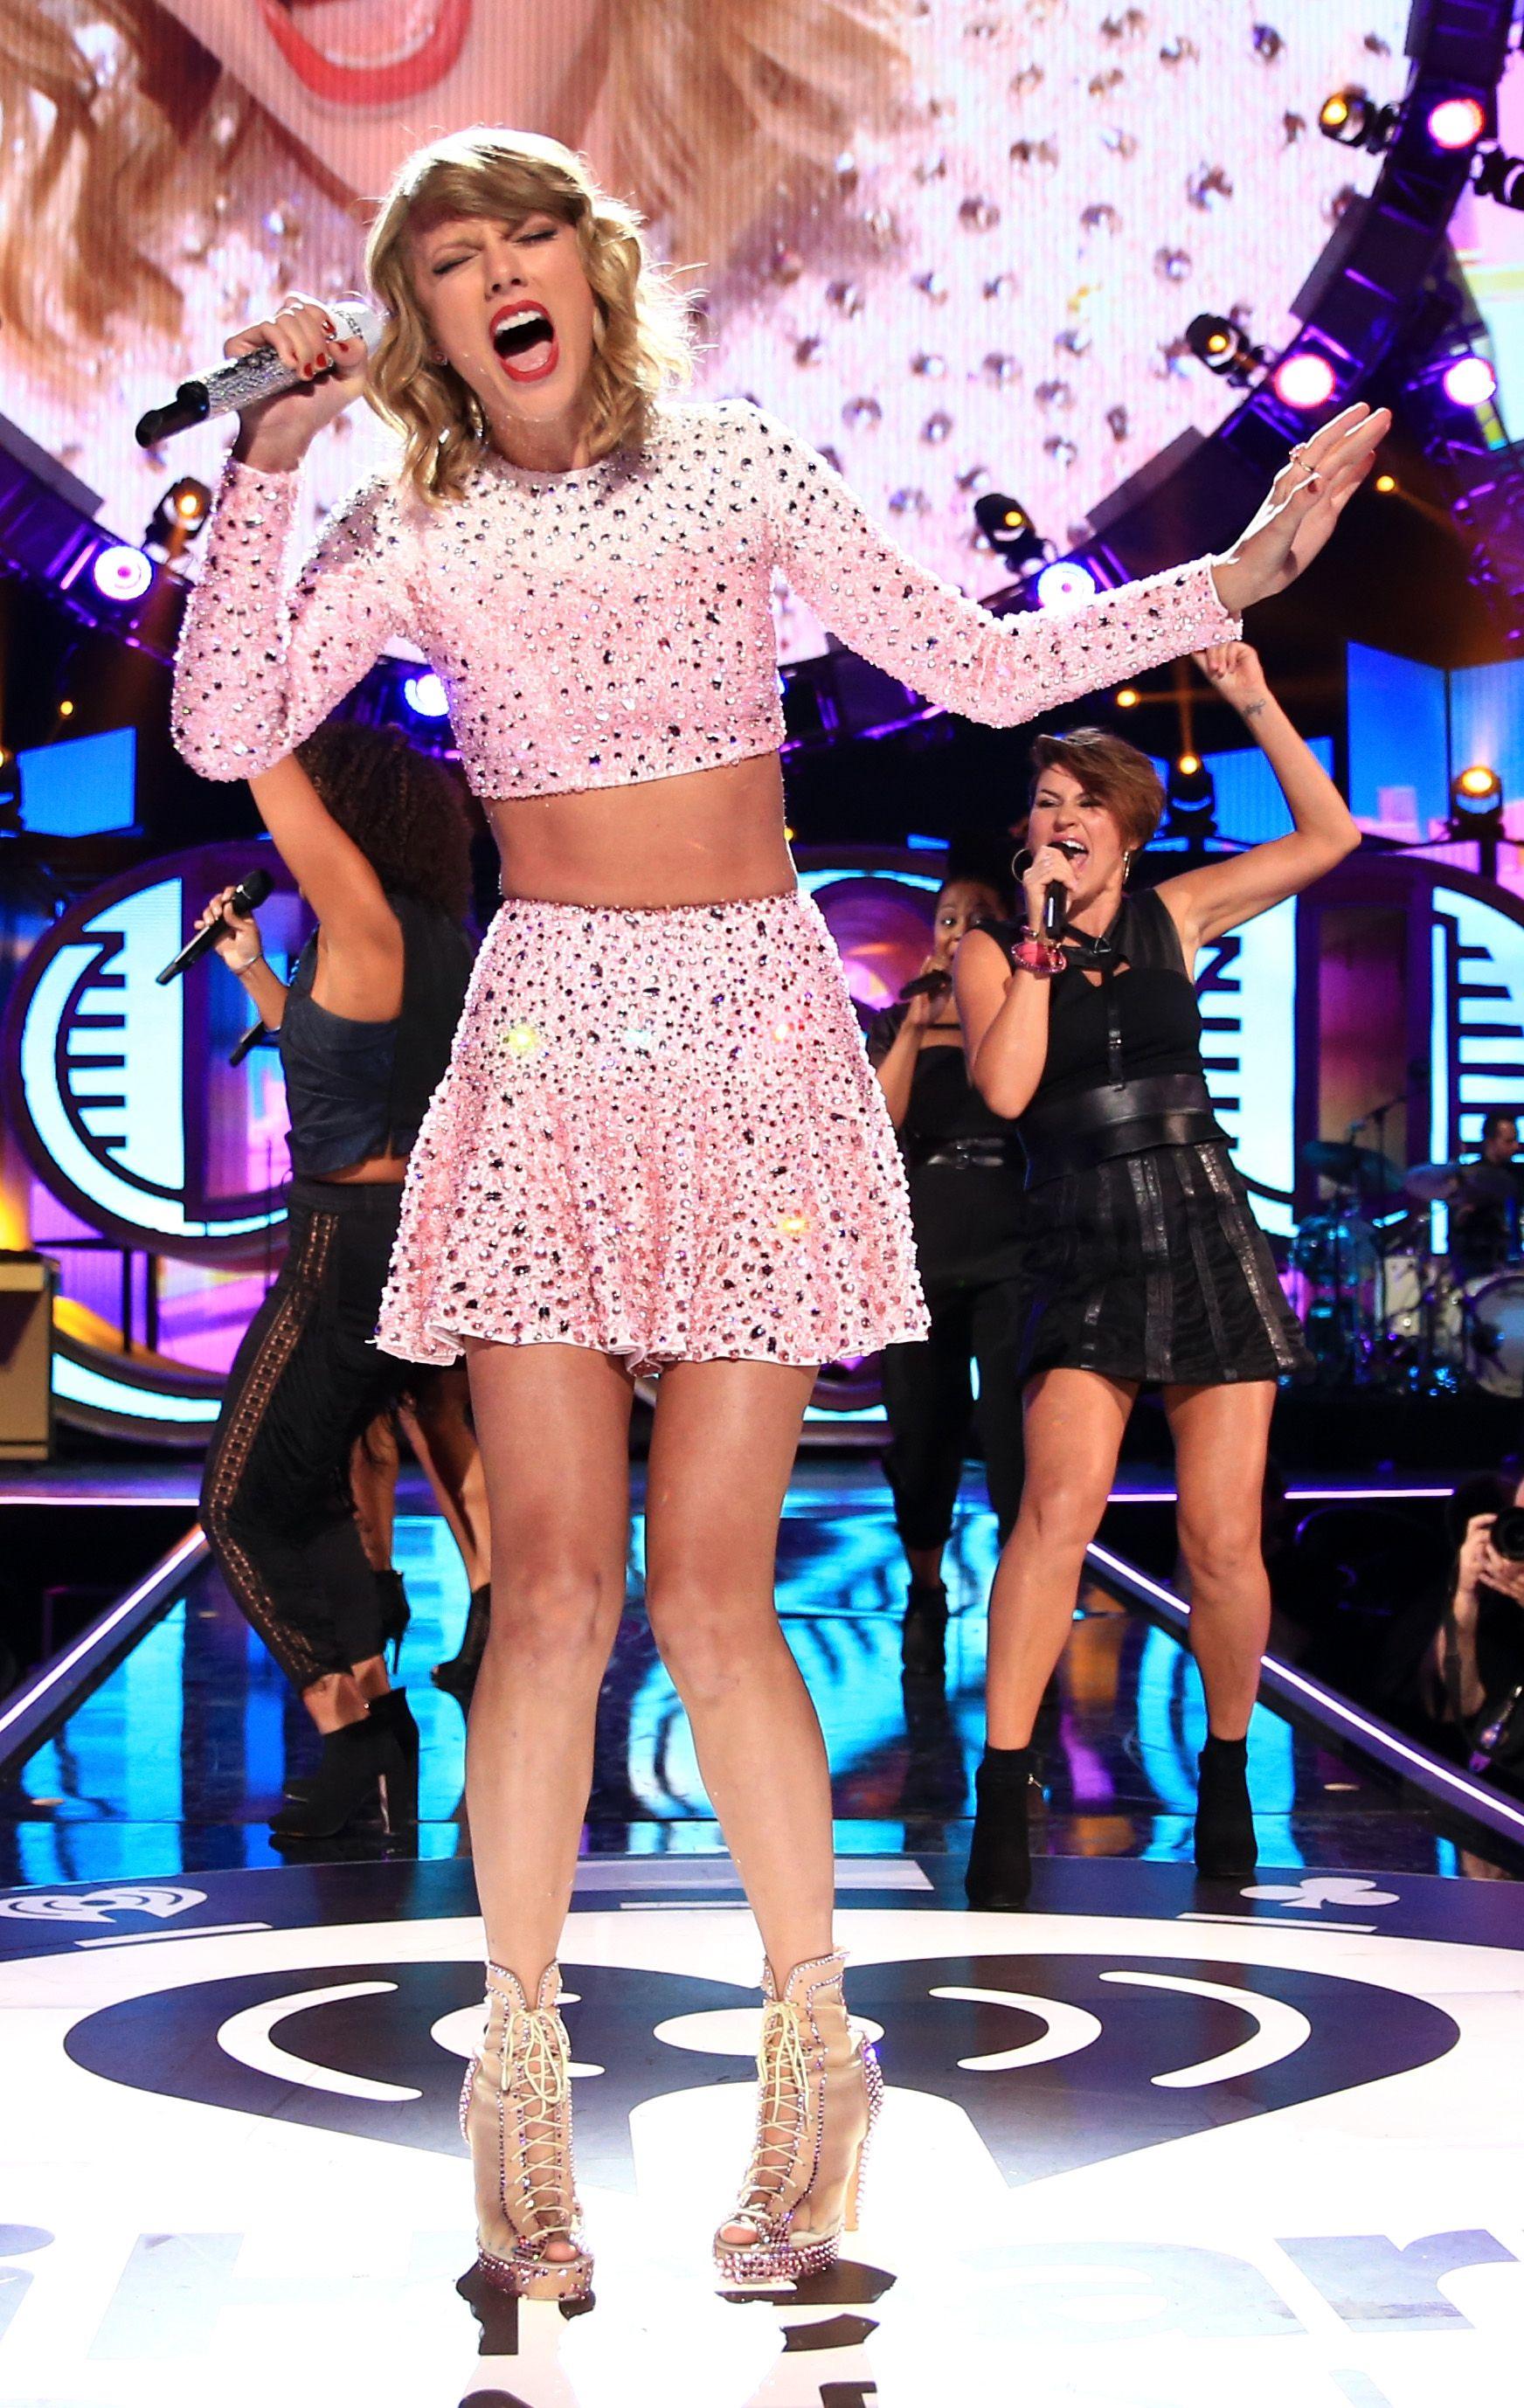 thegirlwhocruisestoomuch // Taylor Swift // | Taylor Swift | Pinterest